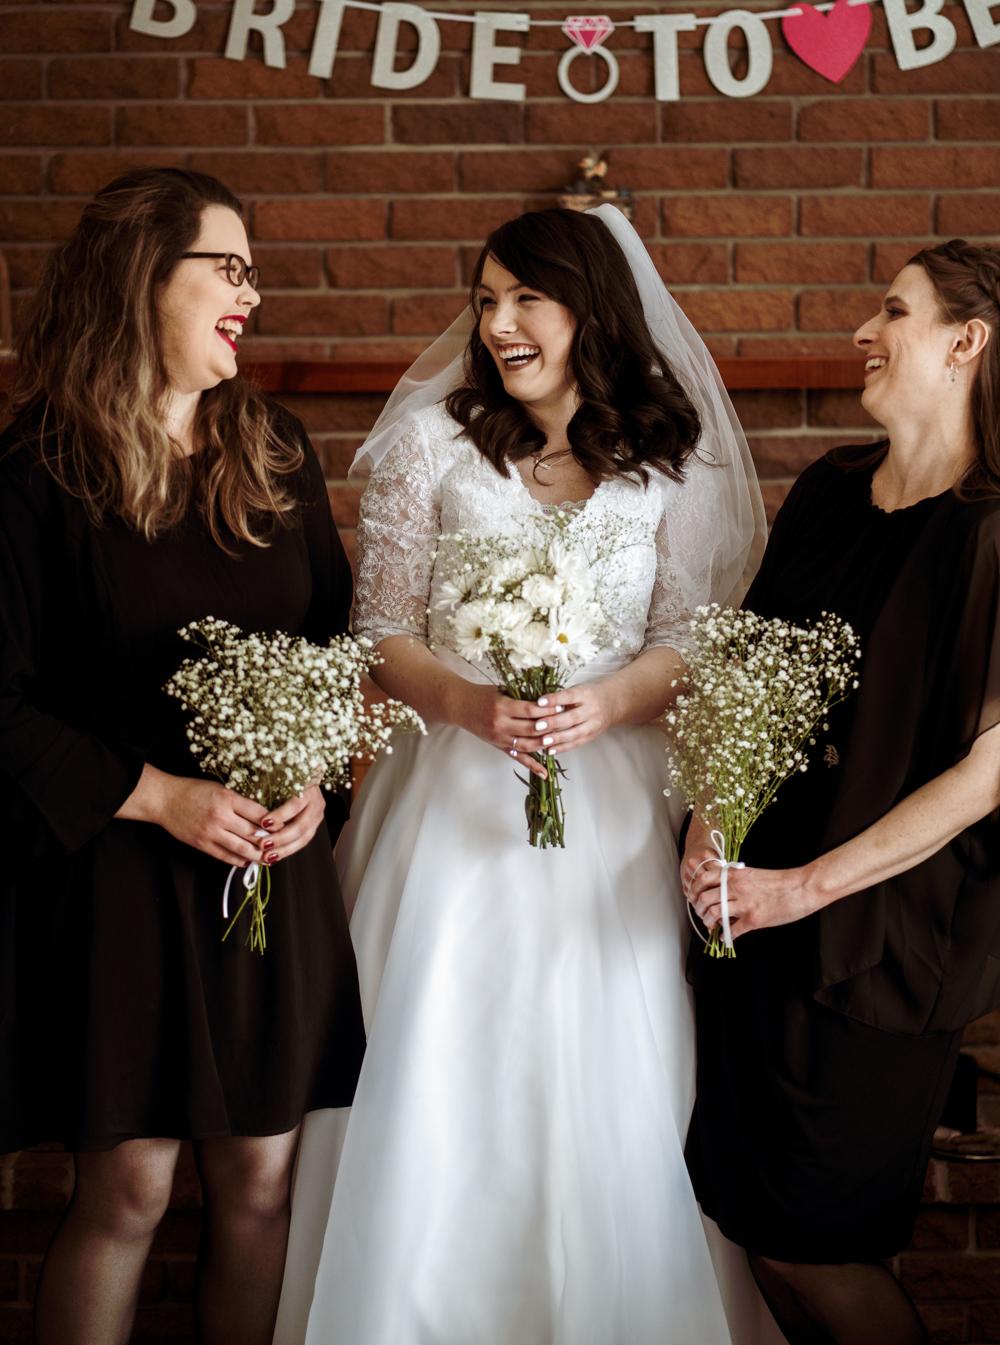 My bridesmaids are beautiful and hilarious.